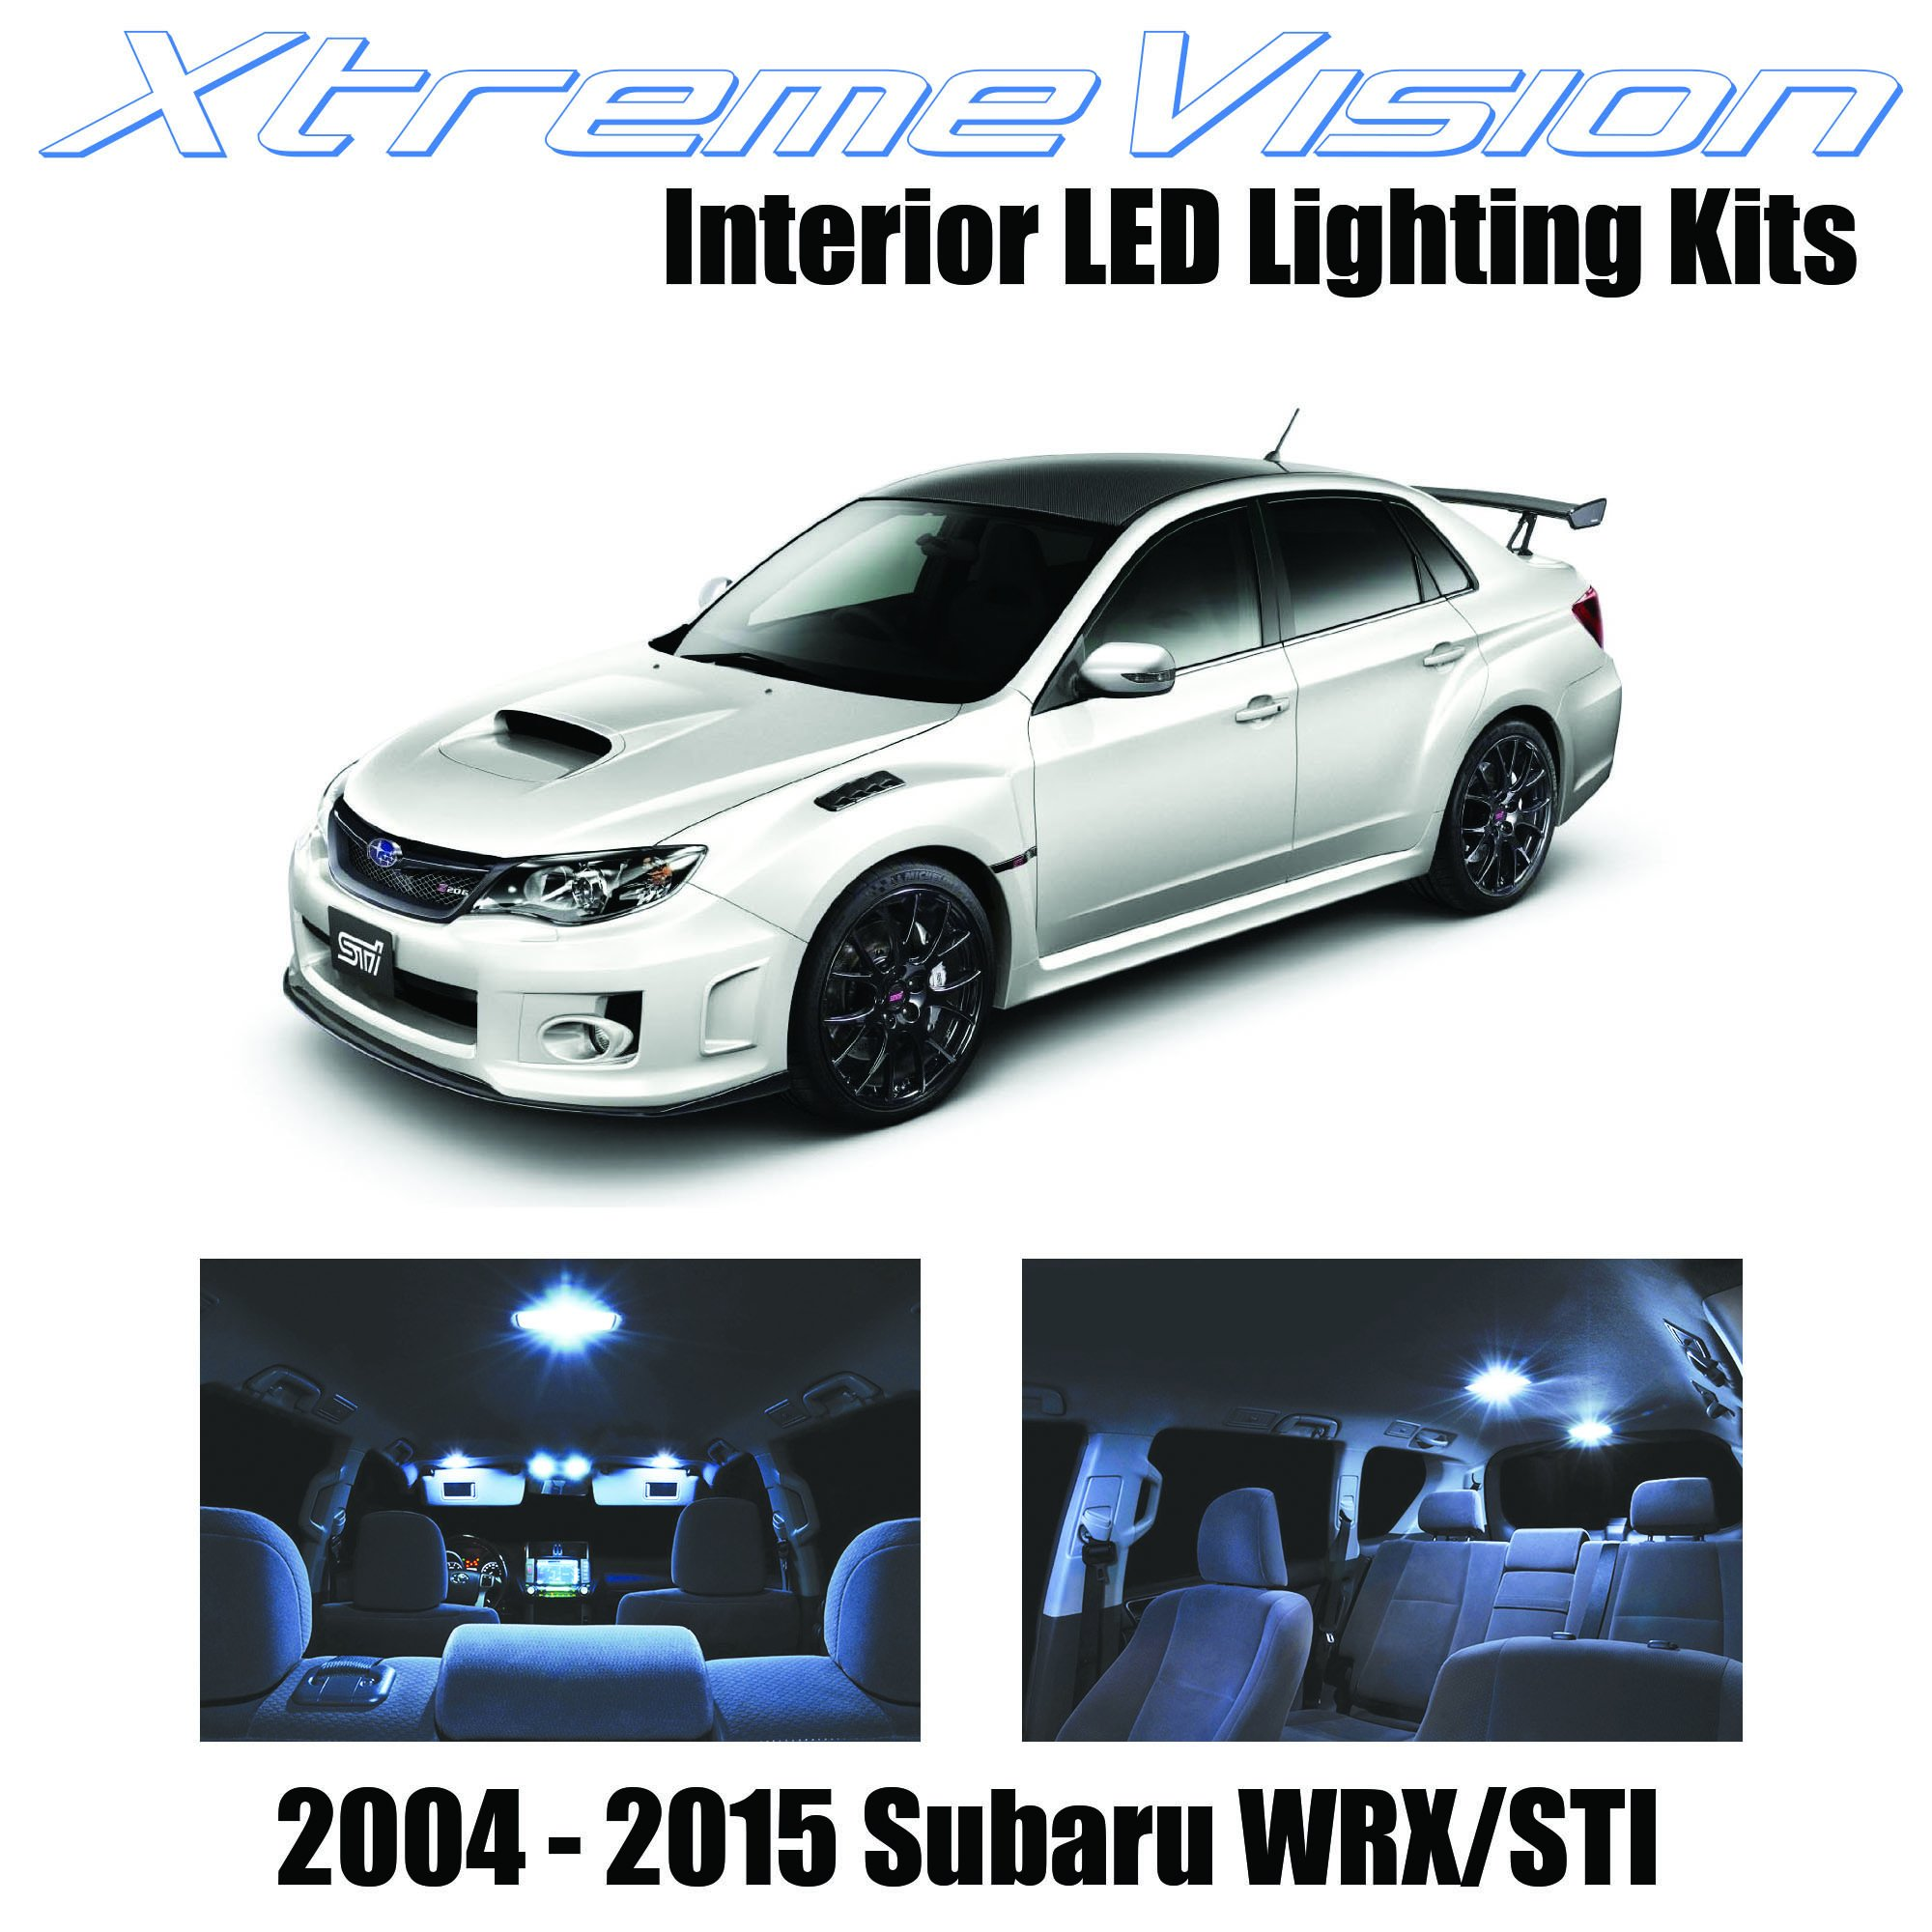 XtremeVision Interior LED for Subaru WRX STI 2004-2015 (6 Pieces) Cool White Interior LED Kit + Installation Tool